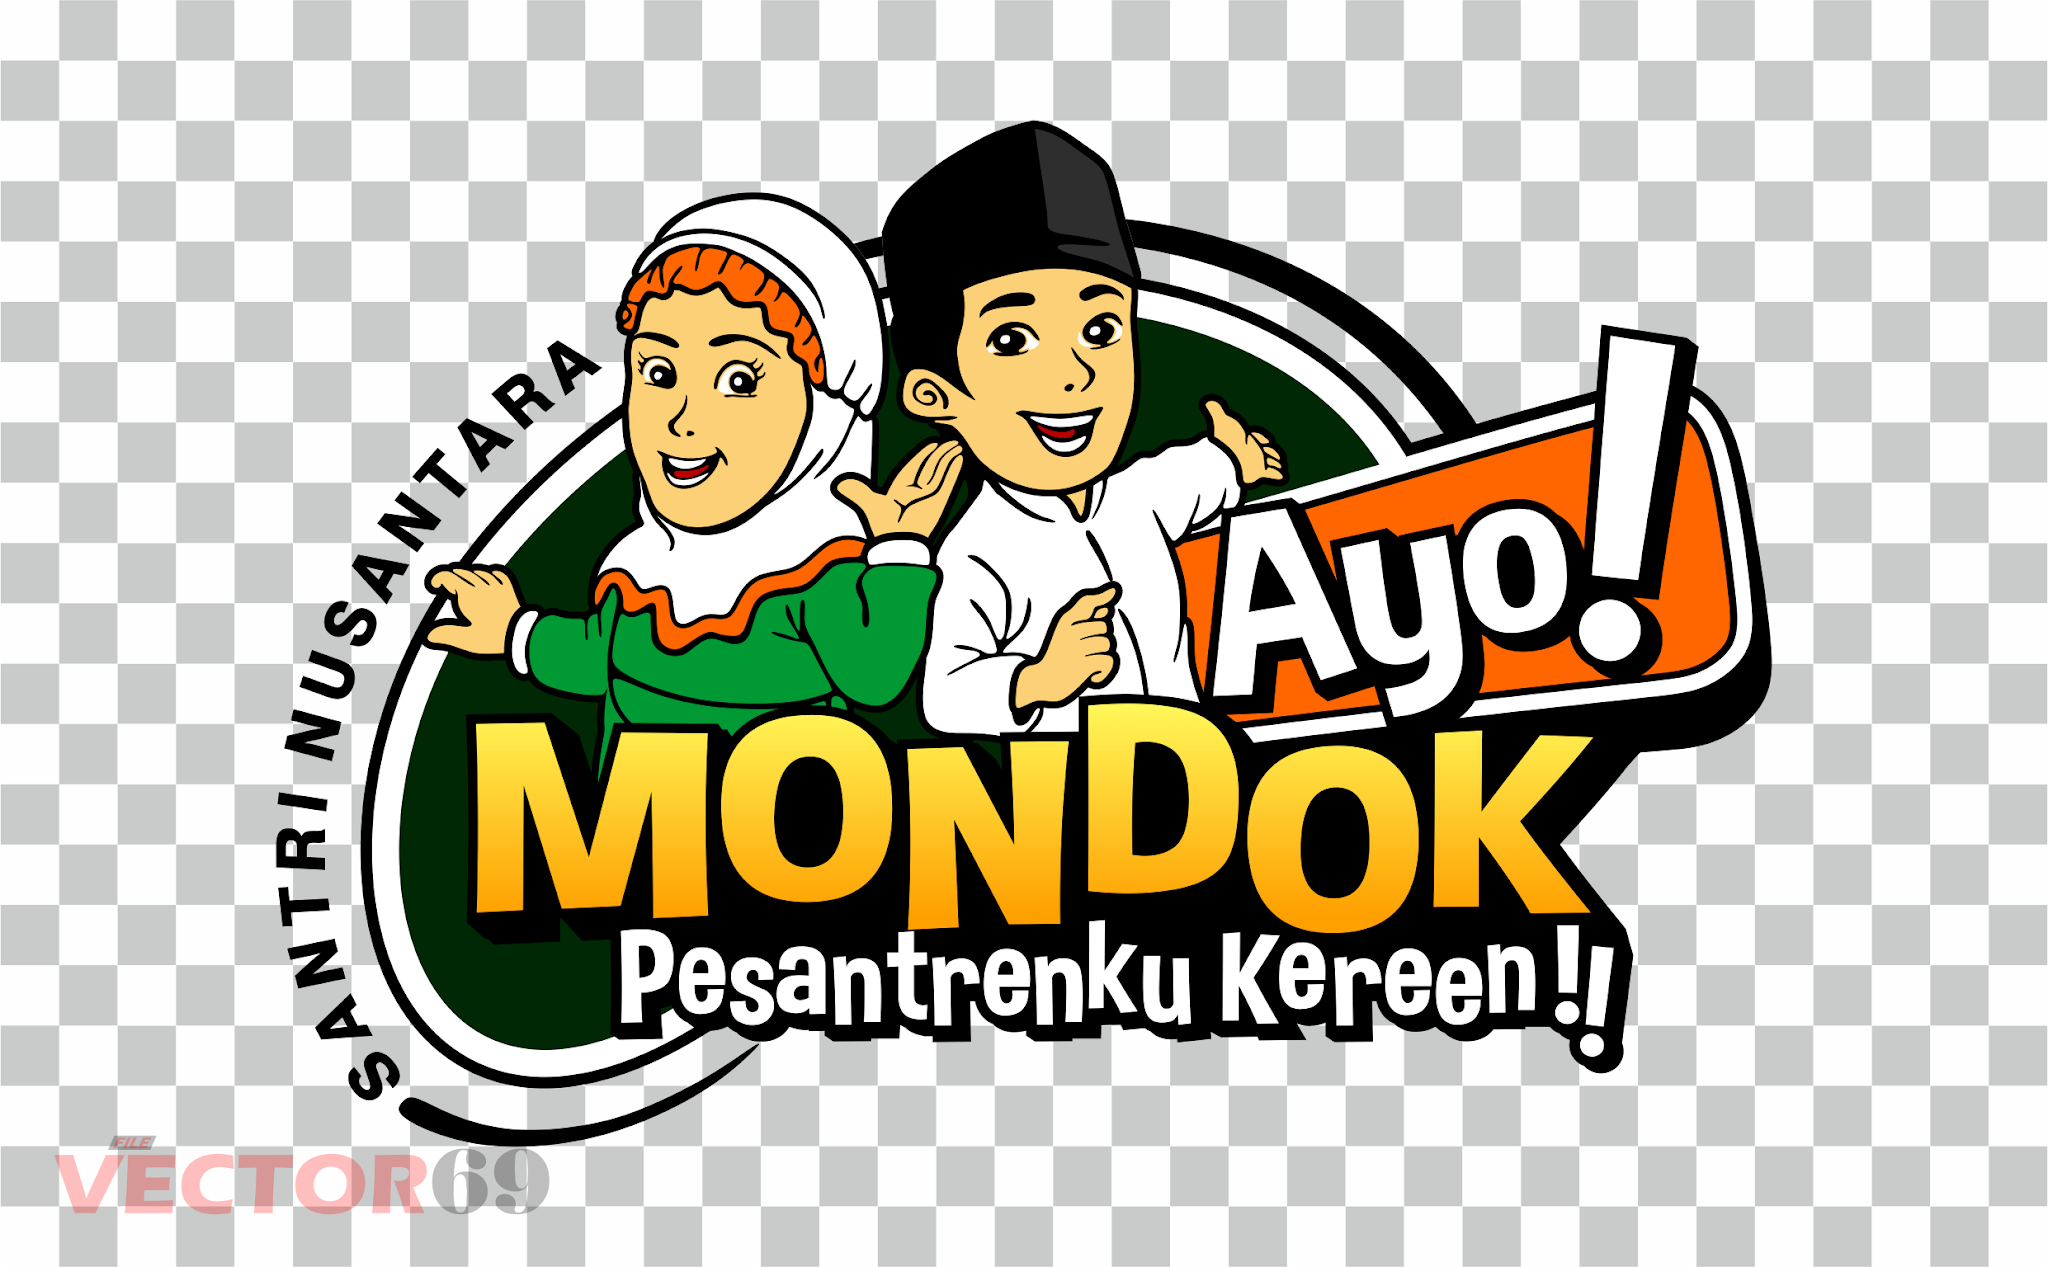 Ayo! Mondok, Pesantrenku Kereen!! Logo - Download Vector File PNG (Portable Network Graphics)